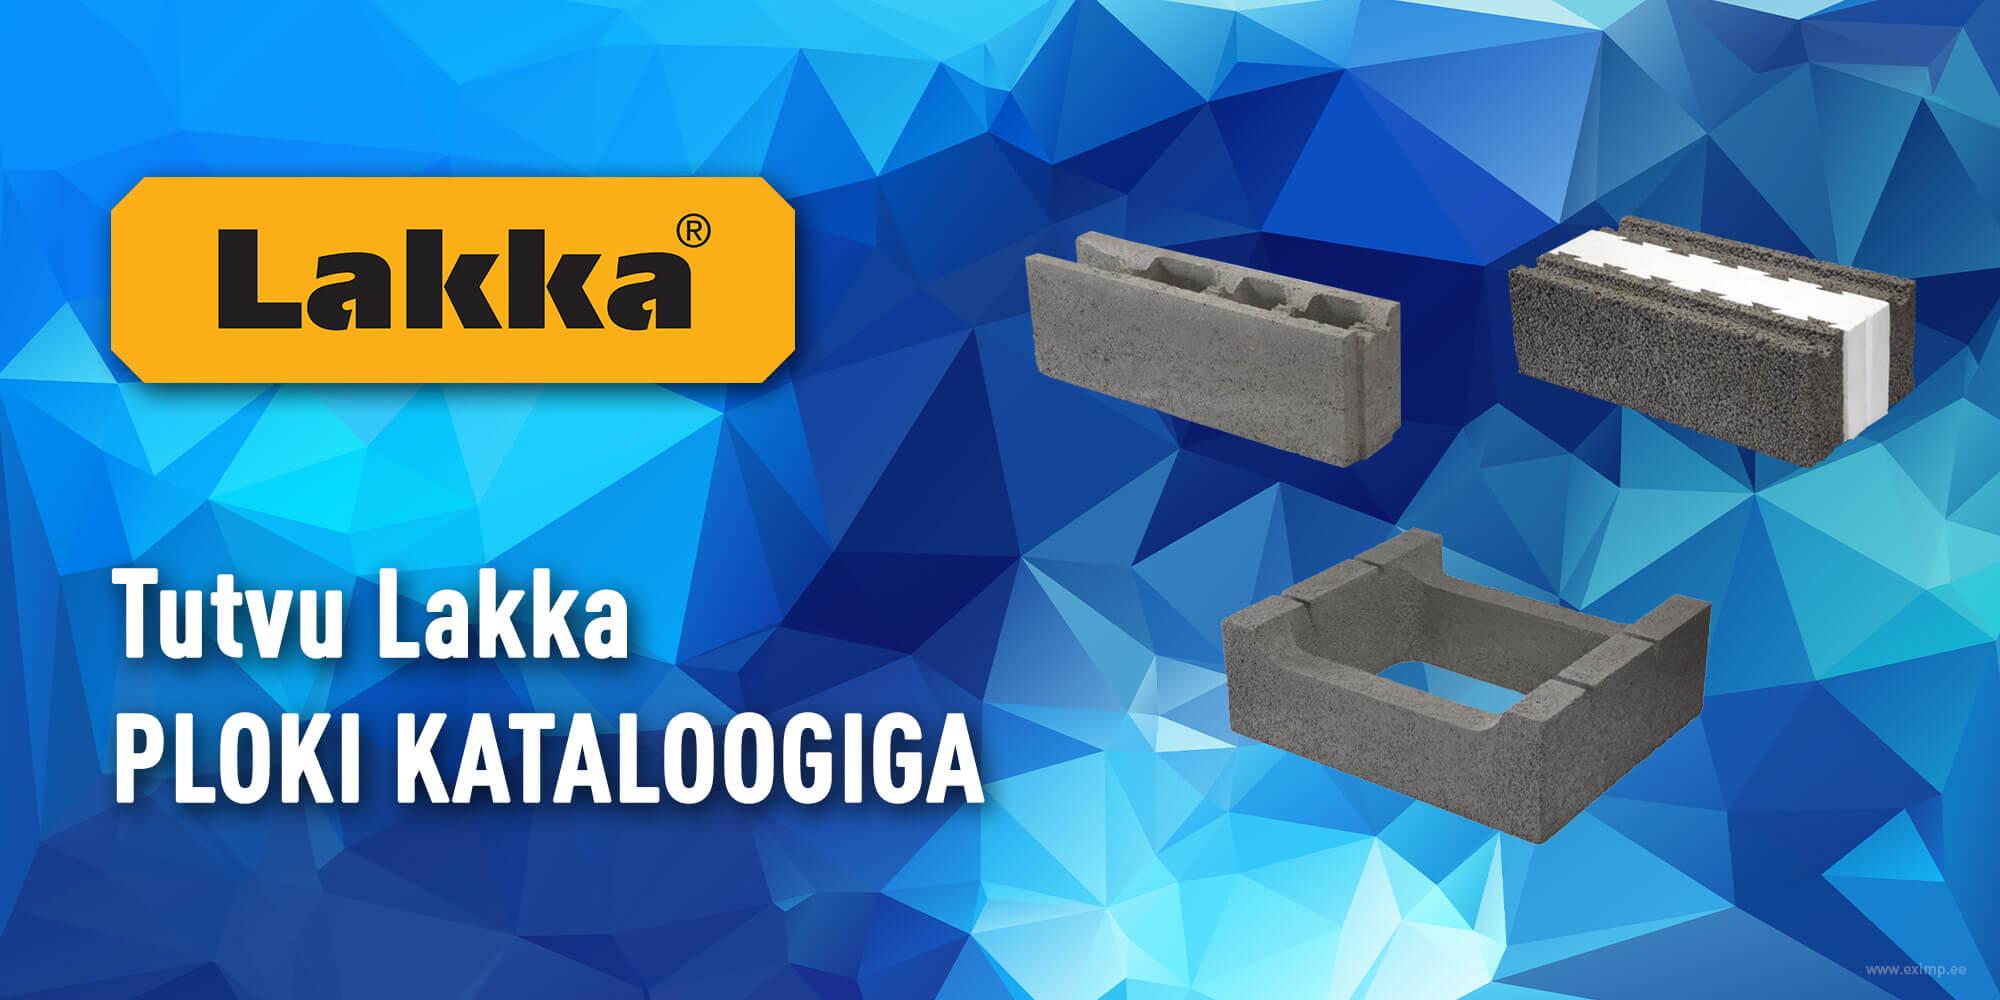 Lakka-Bloki-kataloog